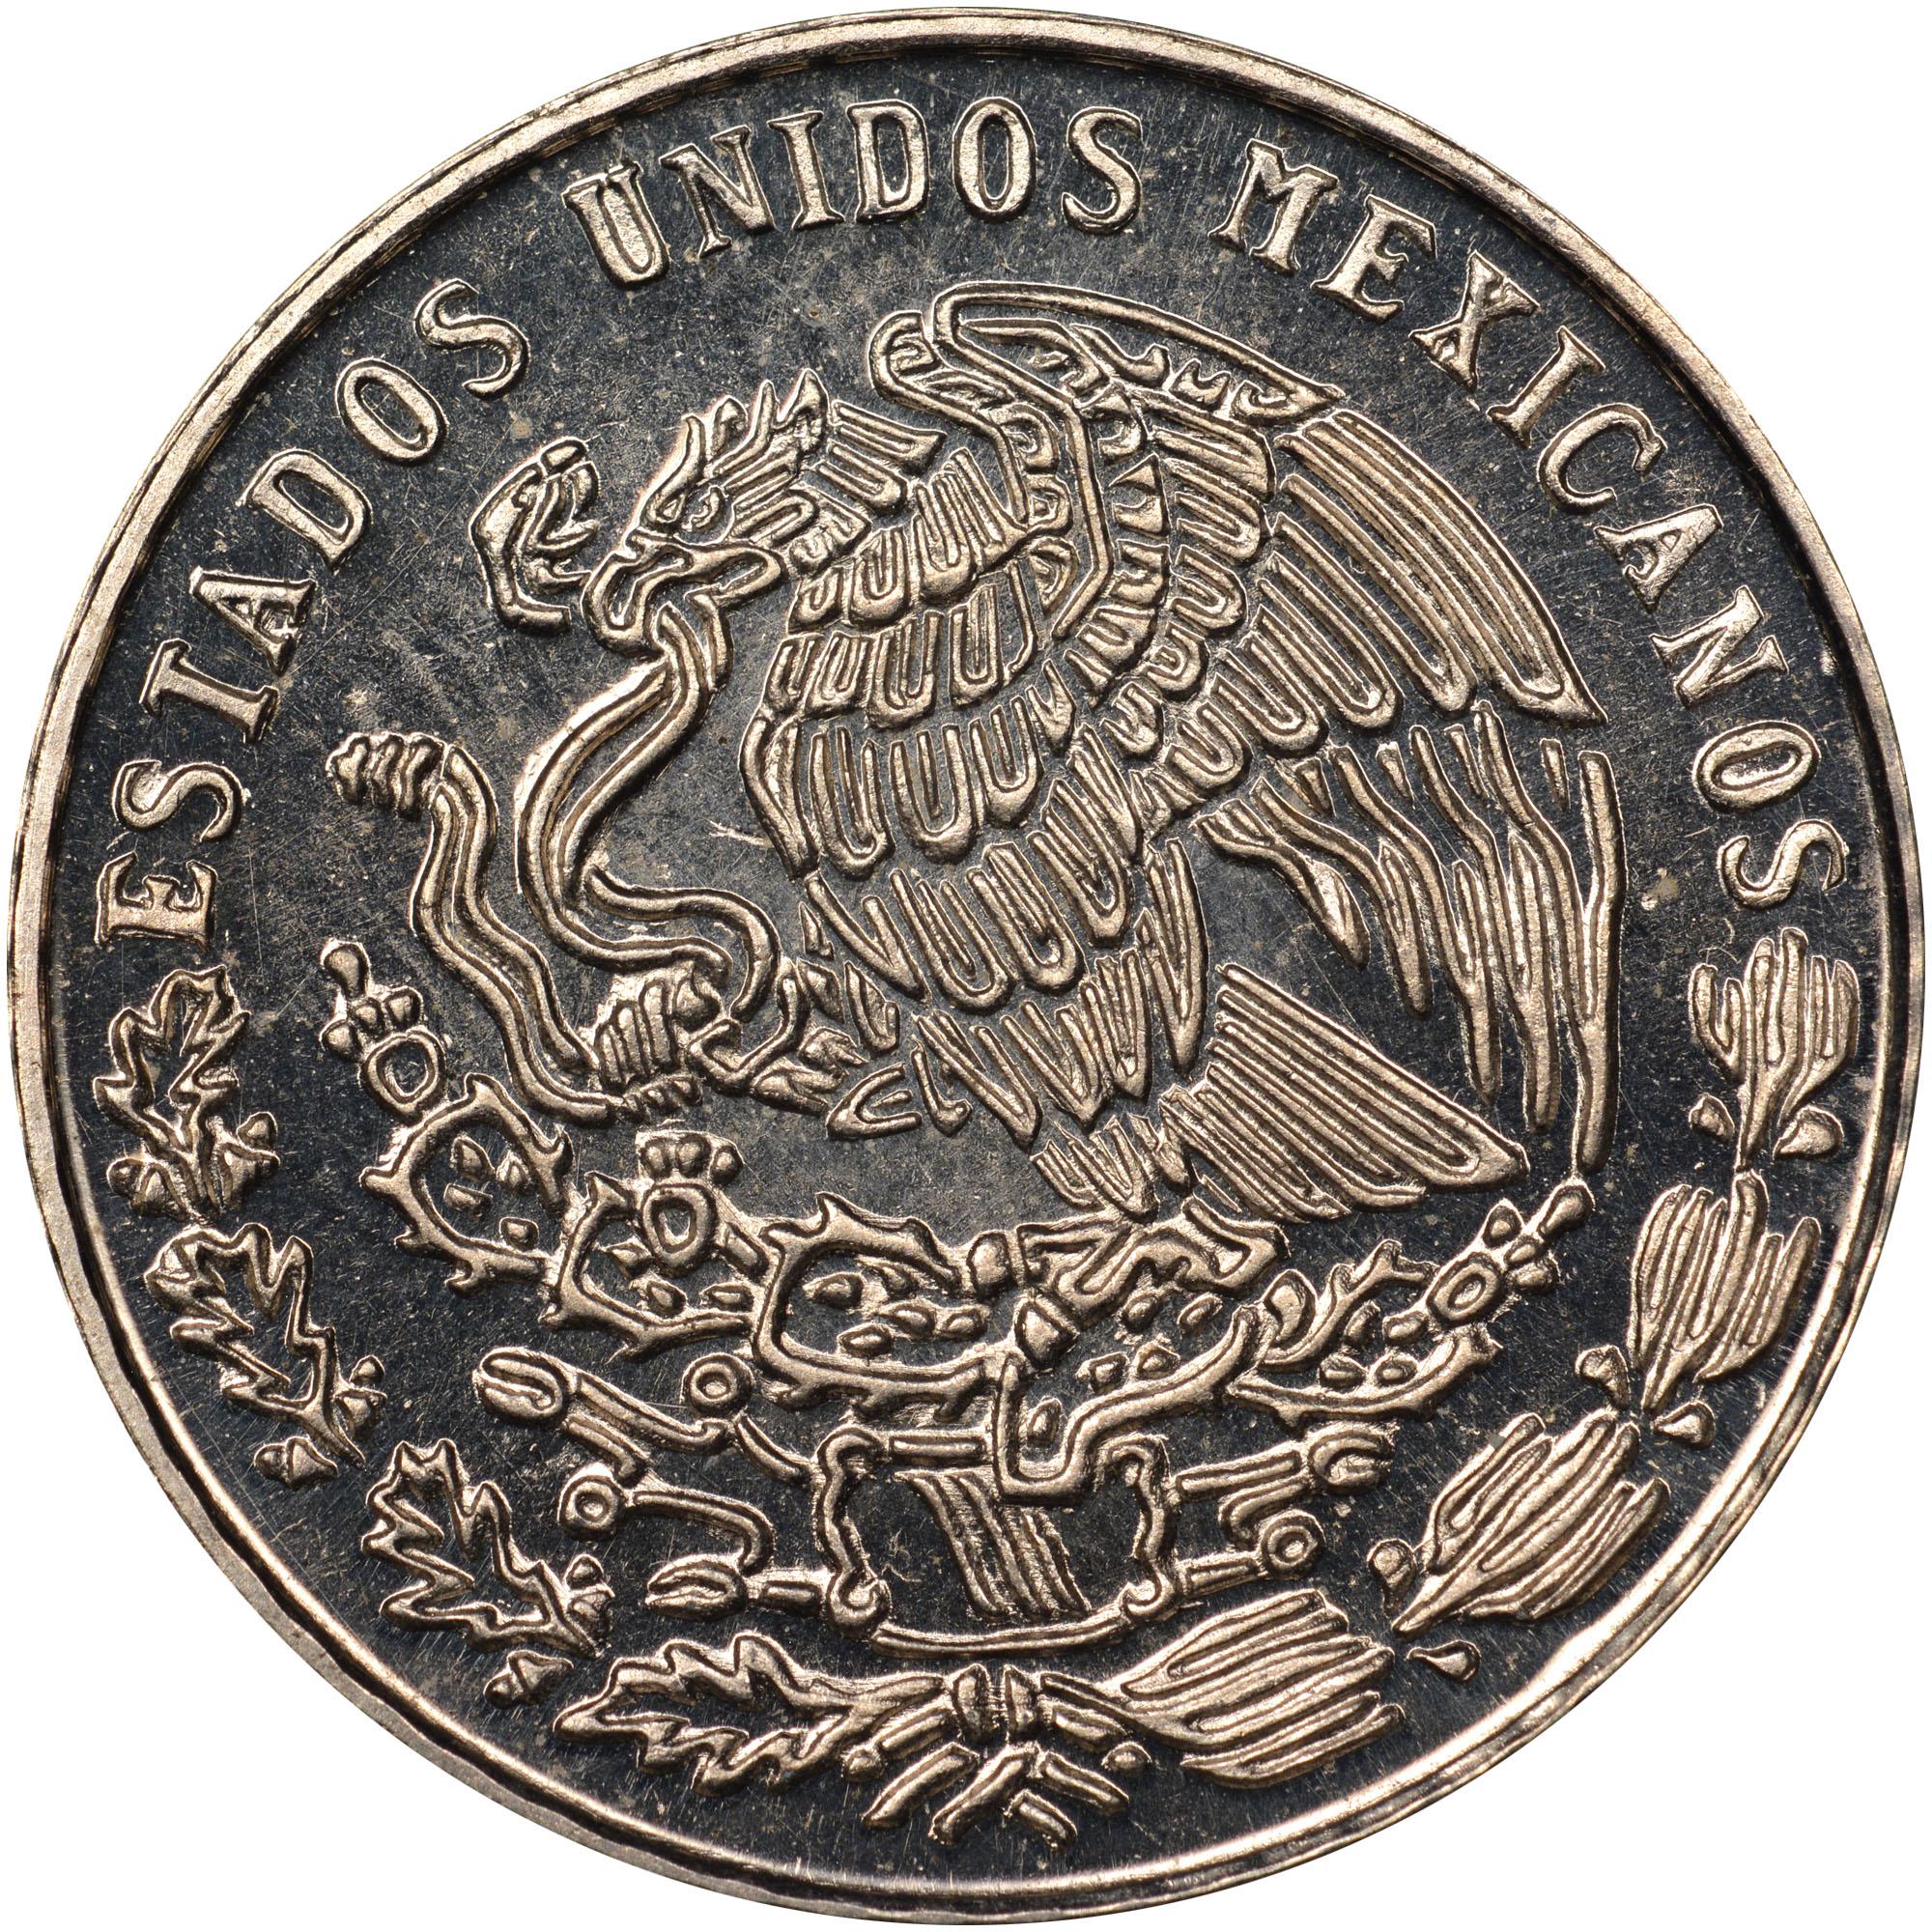 1974-1983 Mexico 20 Centavos KM 442 Prices & Values | NGC